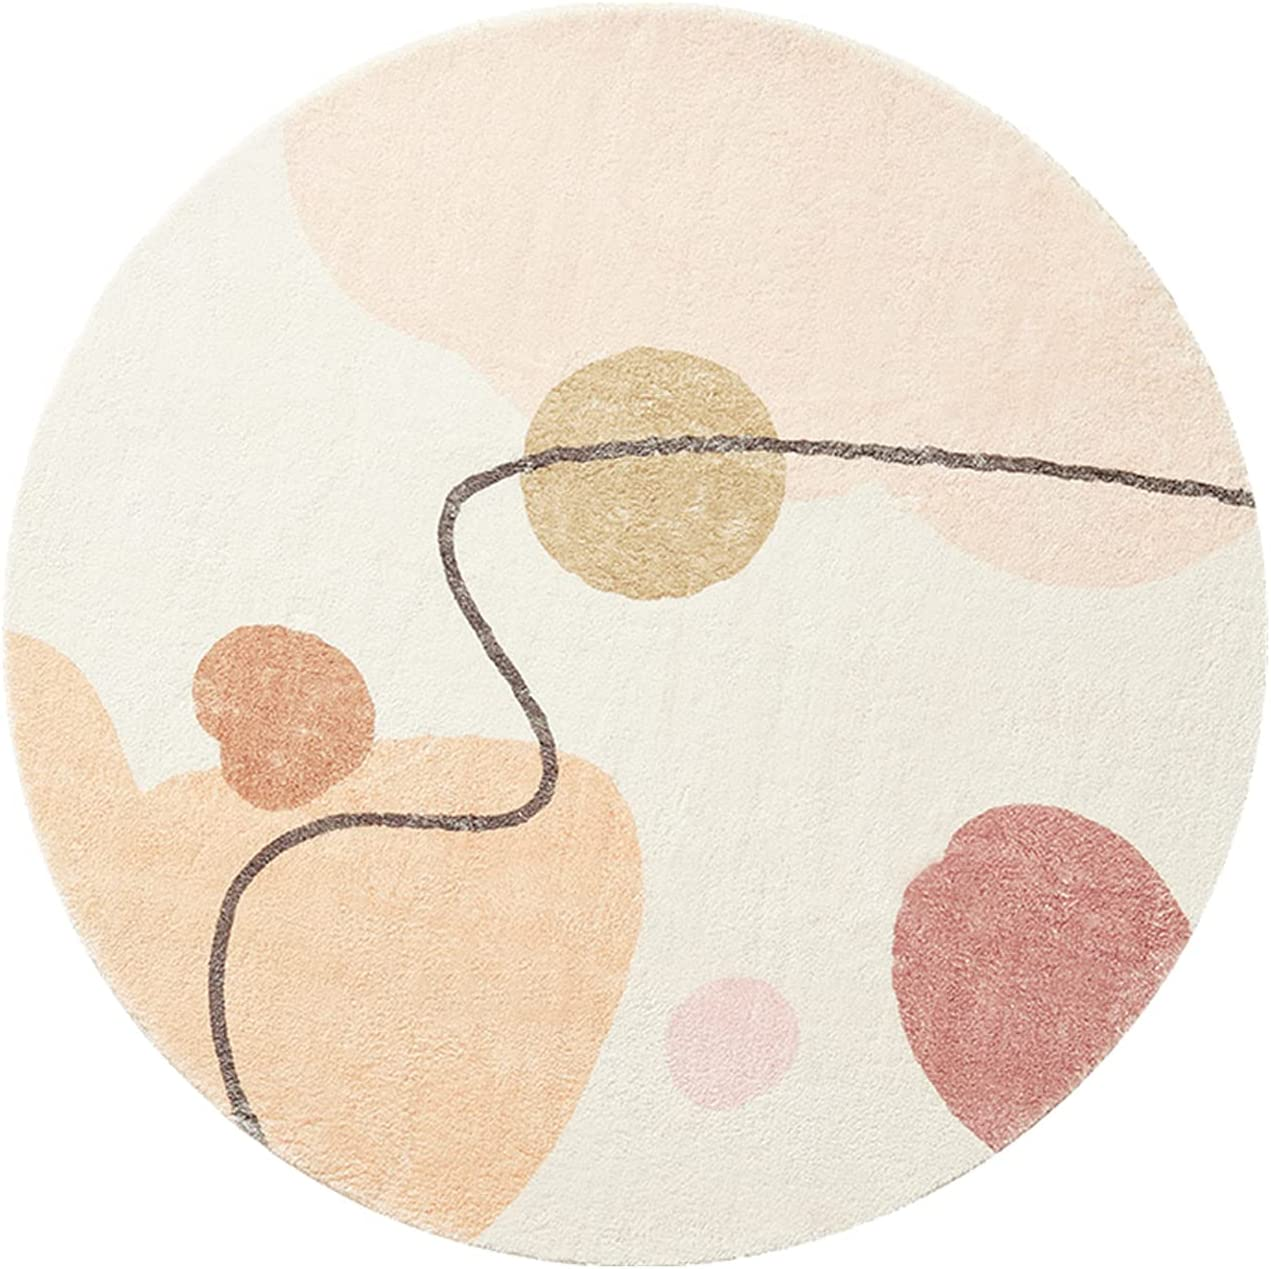 Popular product HEPAI ! Super beauty product restock quality top! Scandinavian Round Carpet Modern Bedroom Fashion Li